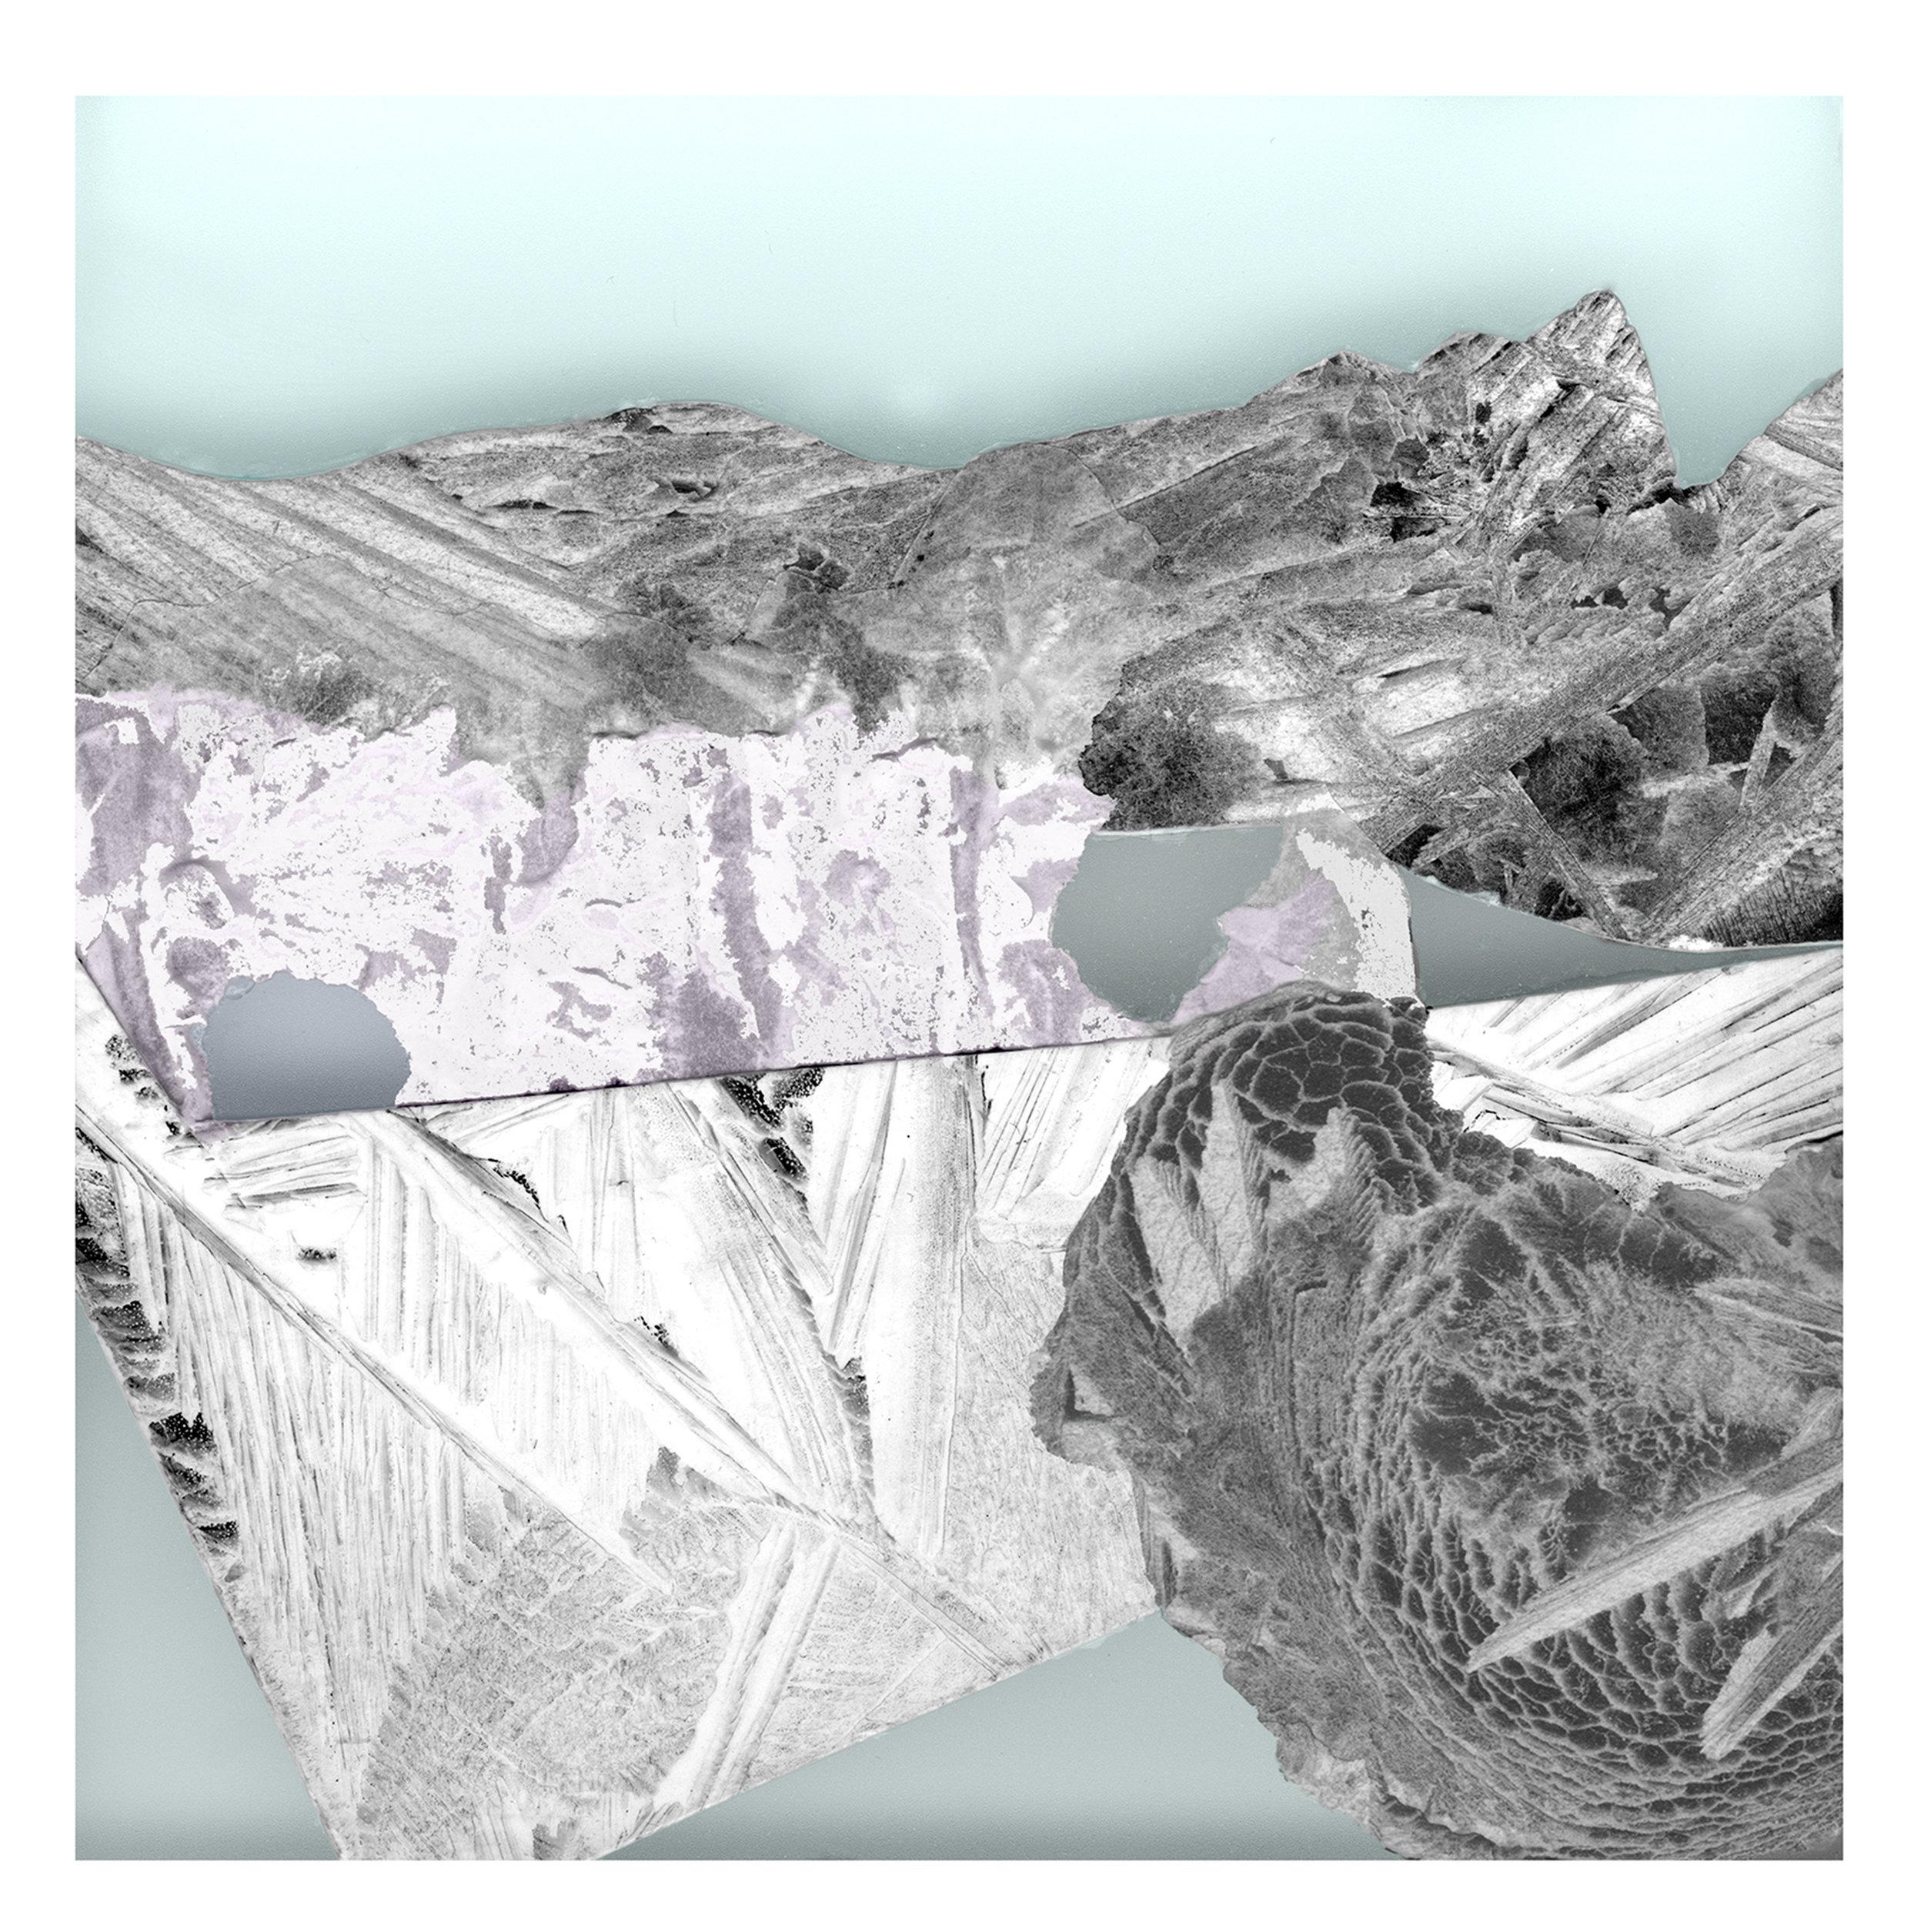 SHELF.CRACK,digitaly influenced.jpeg